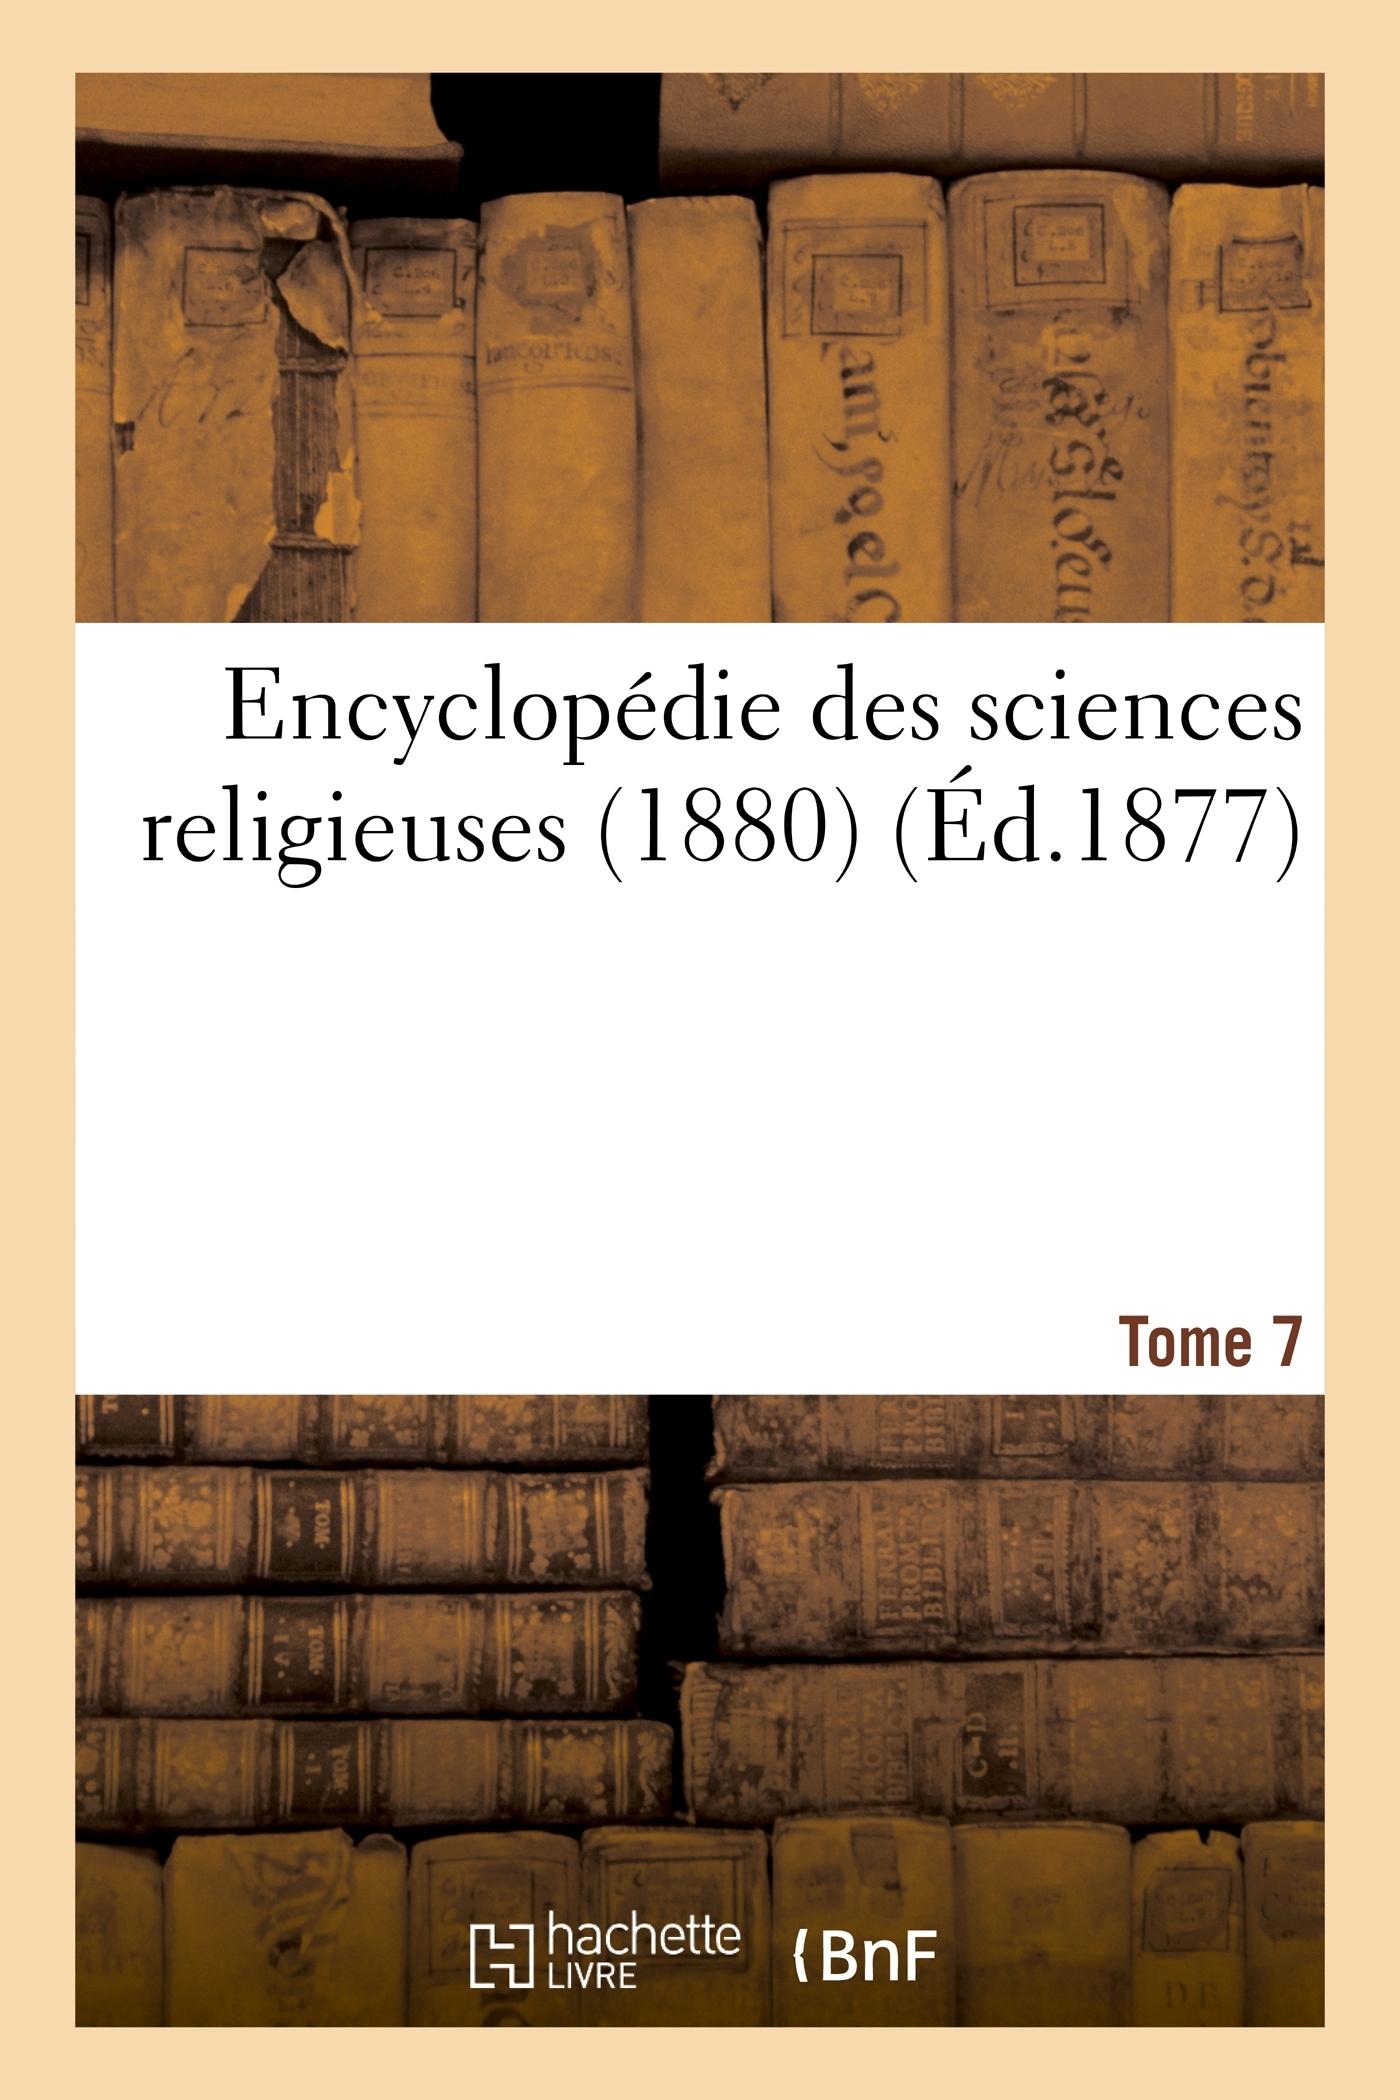 ENCYCLOPEDIE DES SCIENCES RELIGIEUSES. TOME 7 (1880)